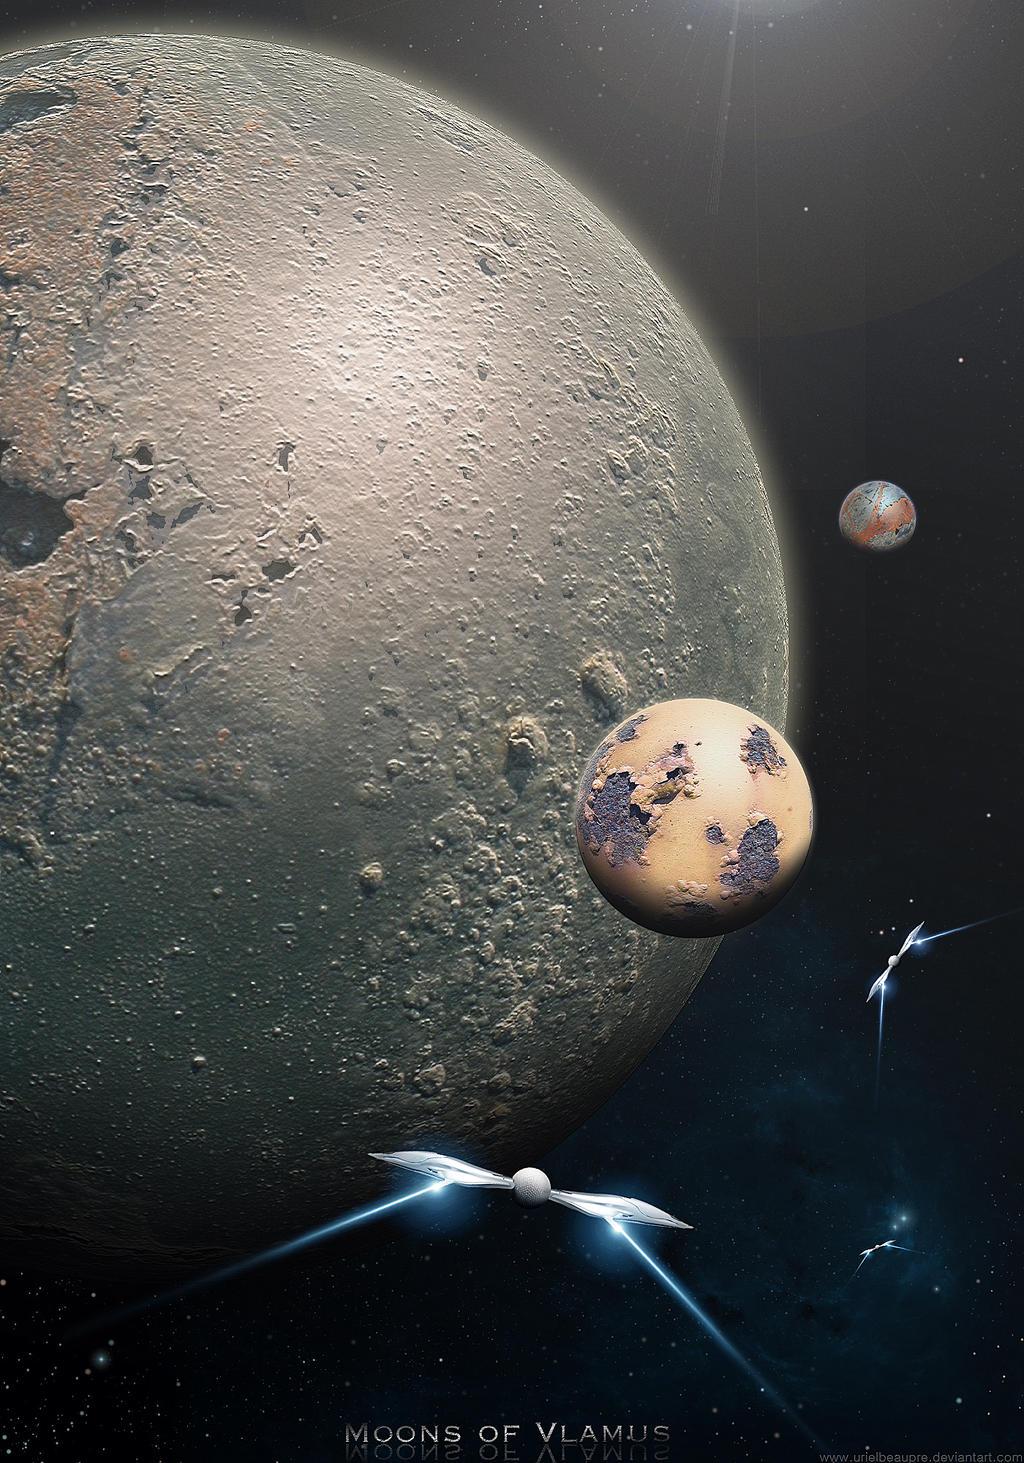 moons of vlamus by urielbeaupre